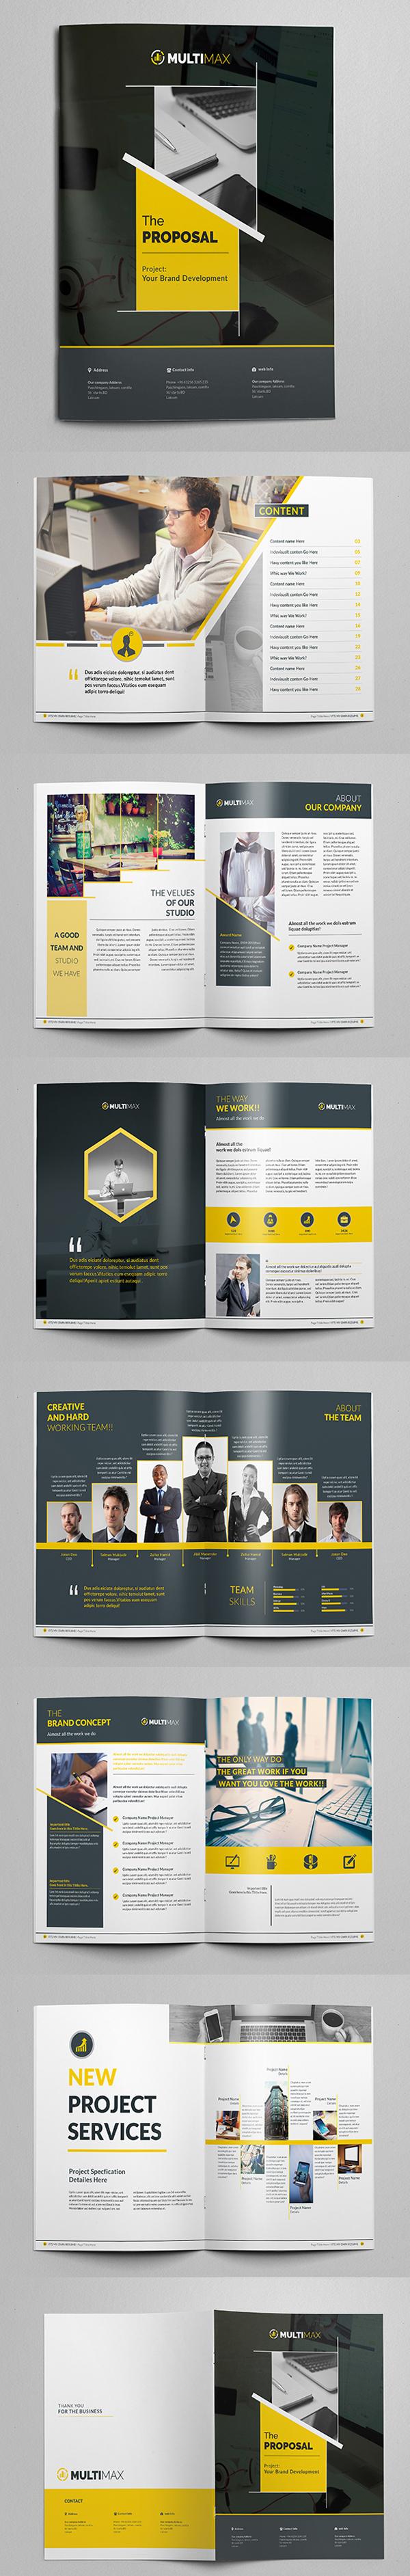 Modern Business Proposal Brochure / Category Design